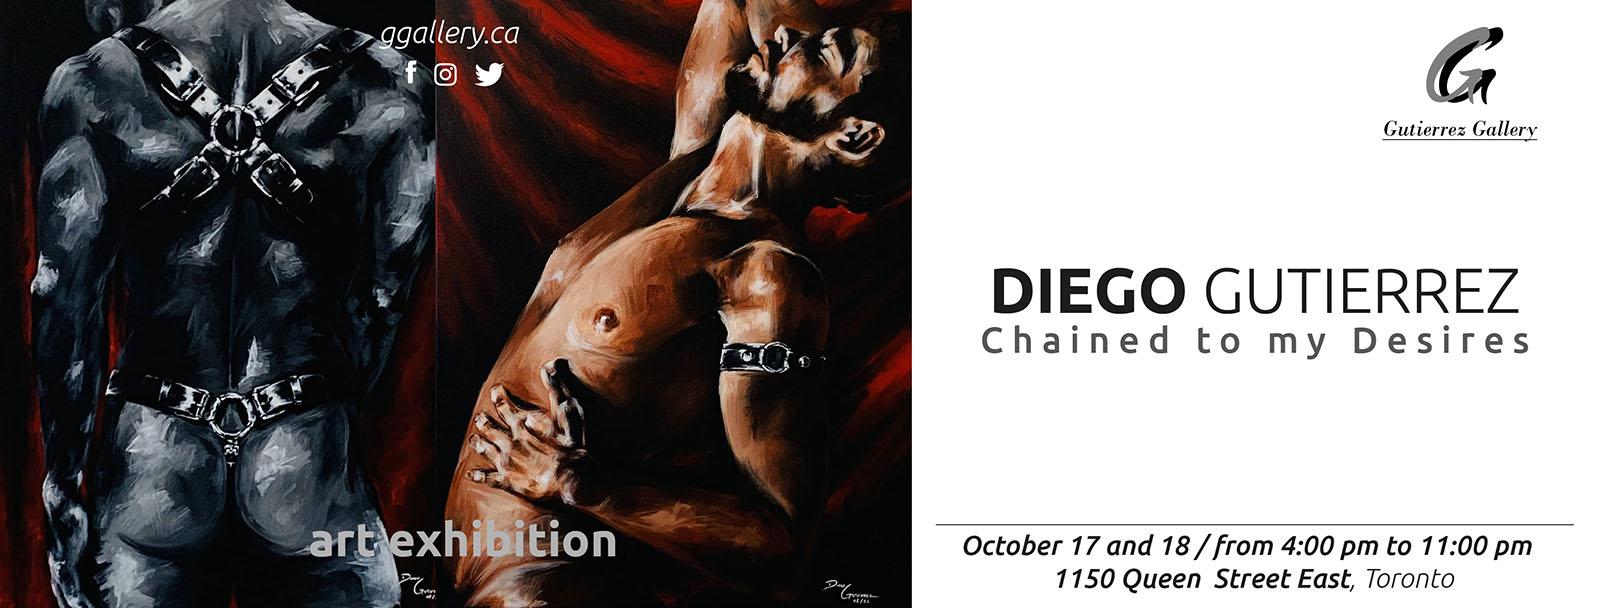 Diego Gutierrez - Chained to my Desires